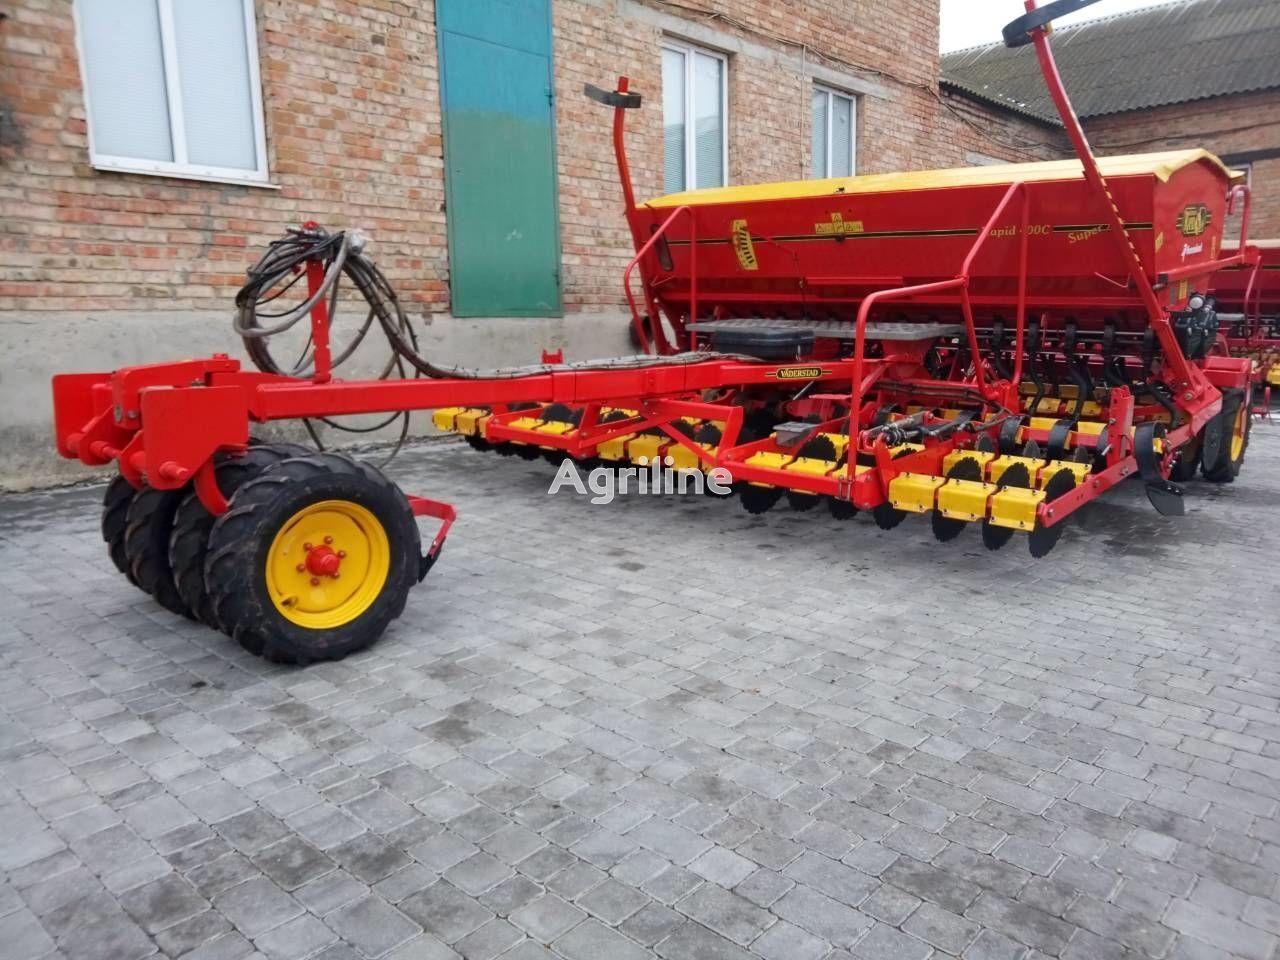 VÄDERSTAD Rapid 400 C Super XL V Nalichii v Zvenigorodke mechanical seed drill